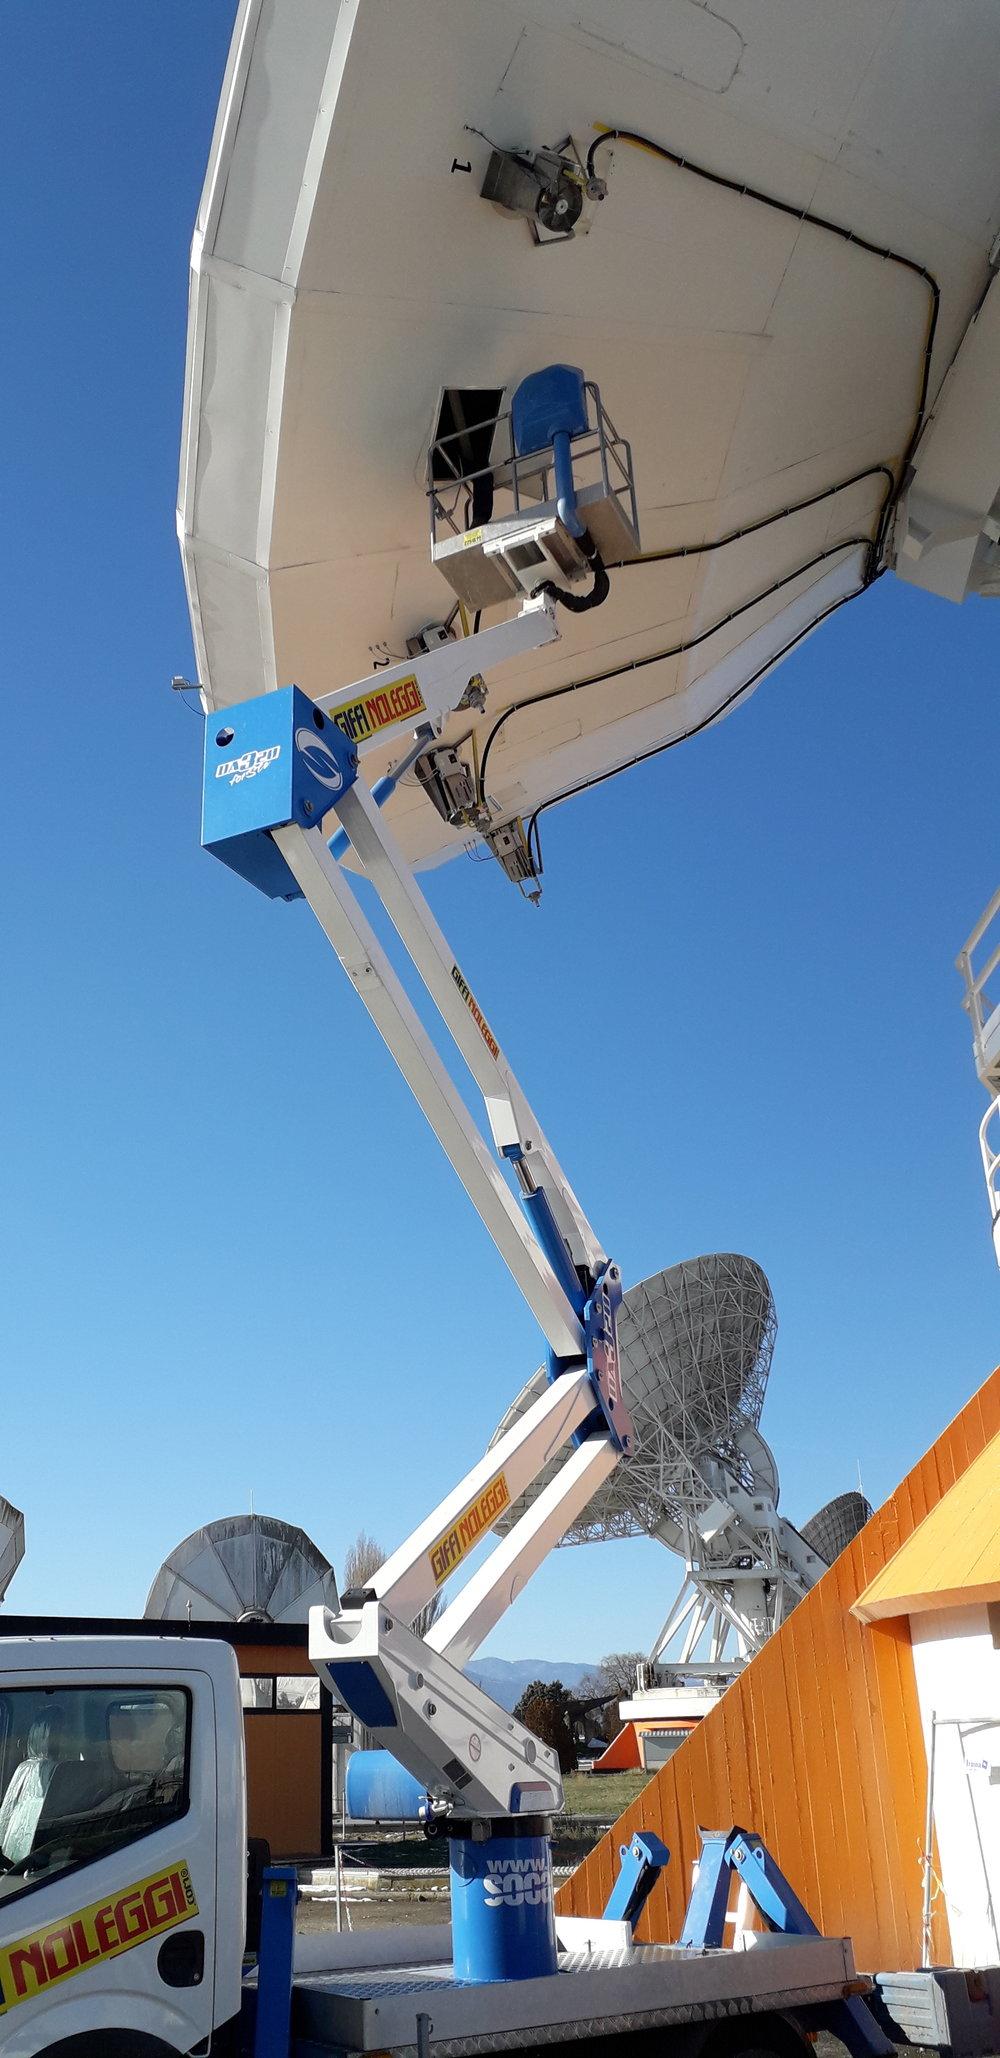 Biemmedue riscaldamento professionale generatori d'aria calda made in italy20190115_114114.jpg